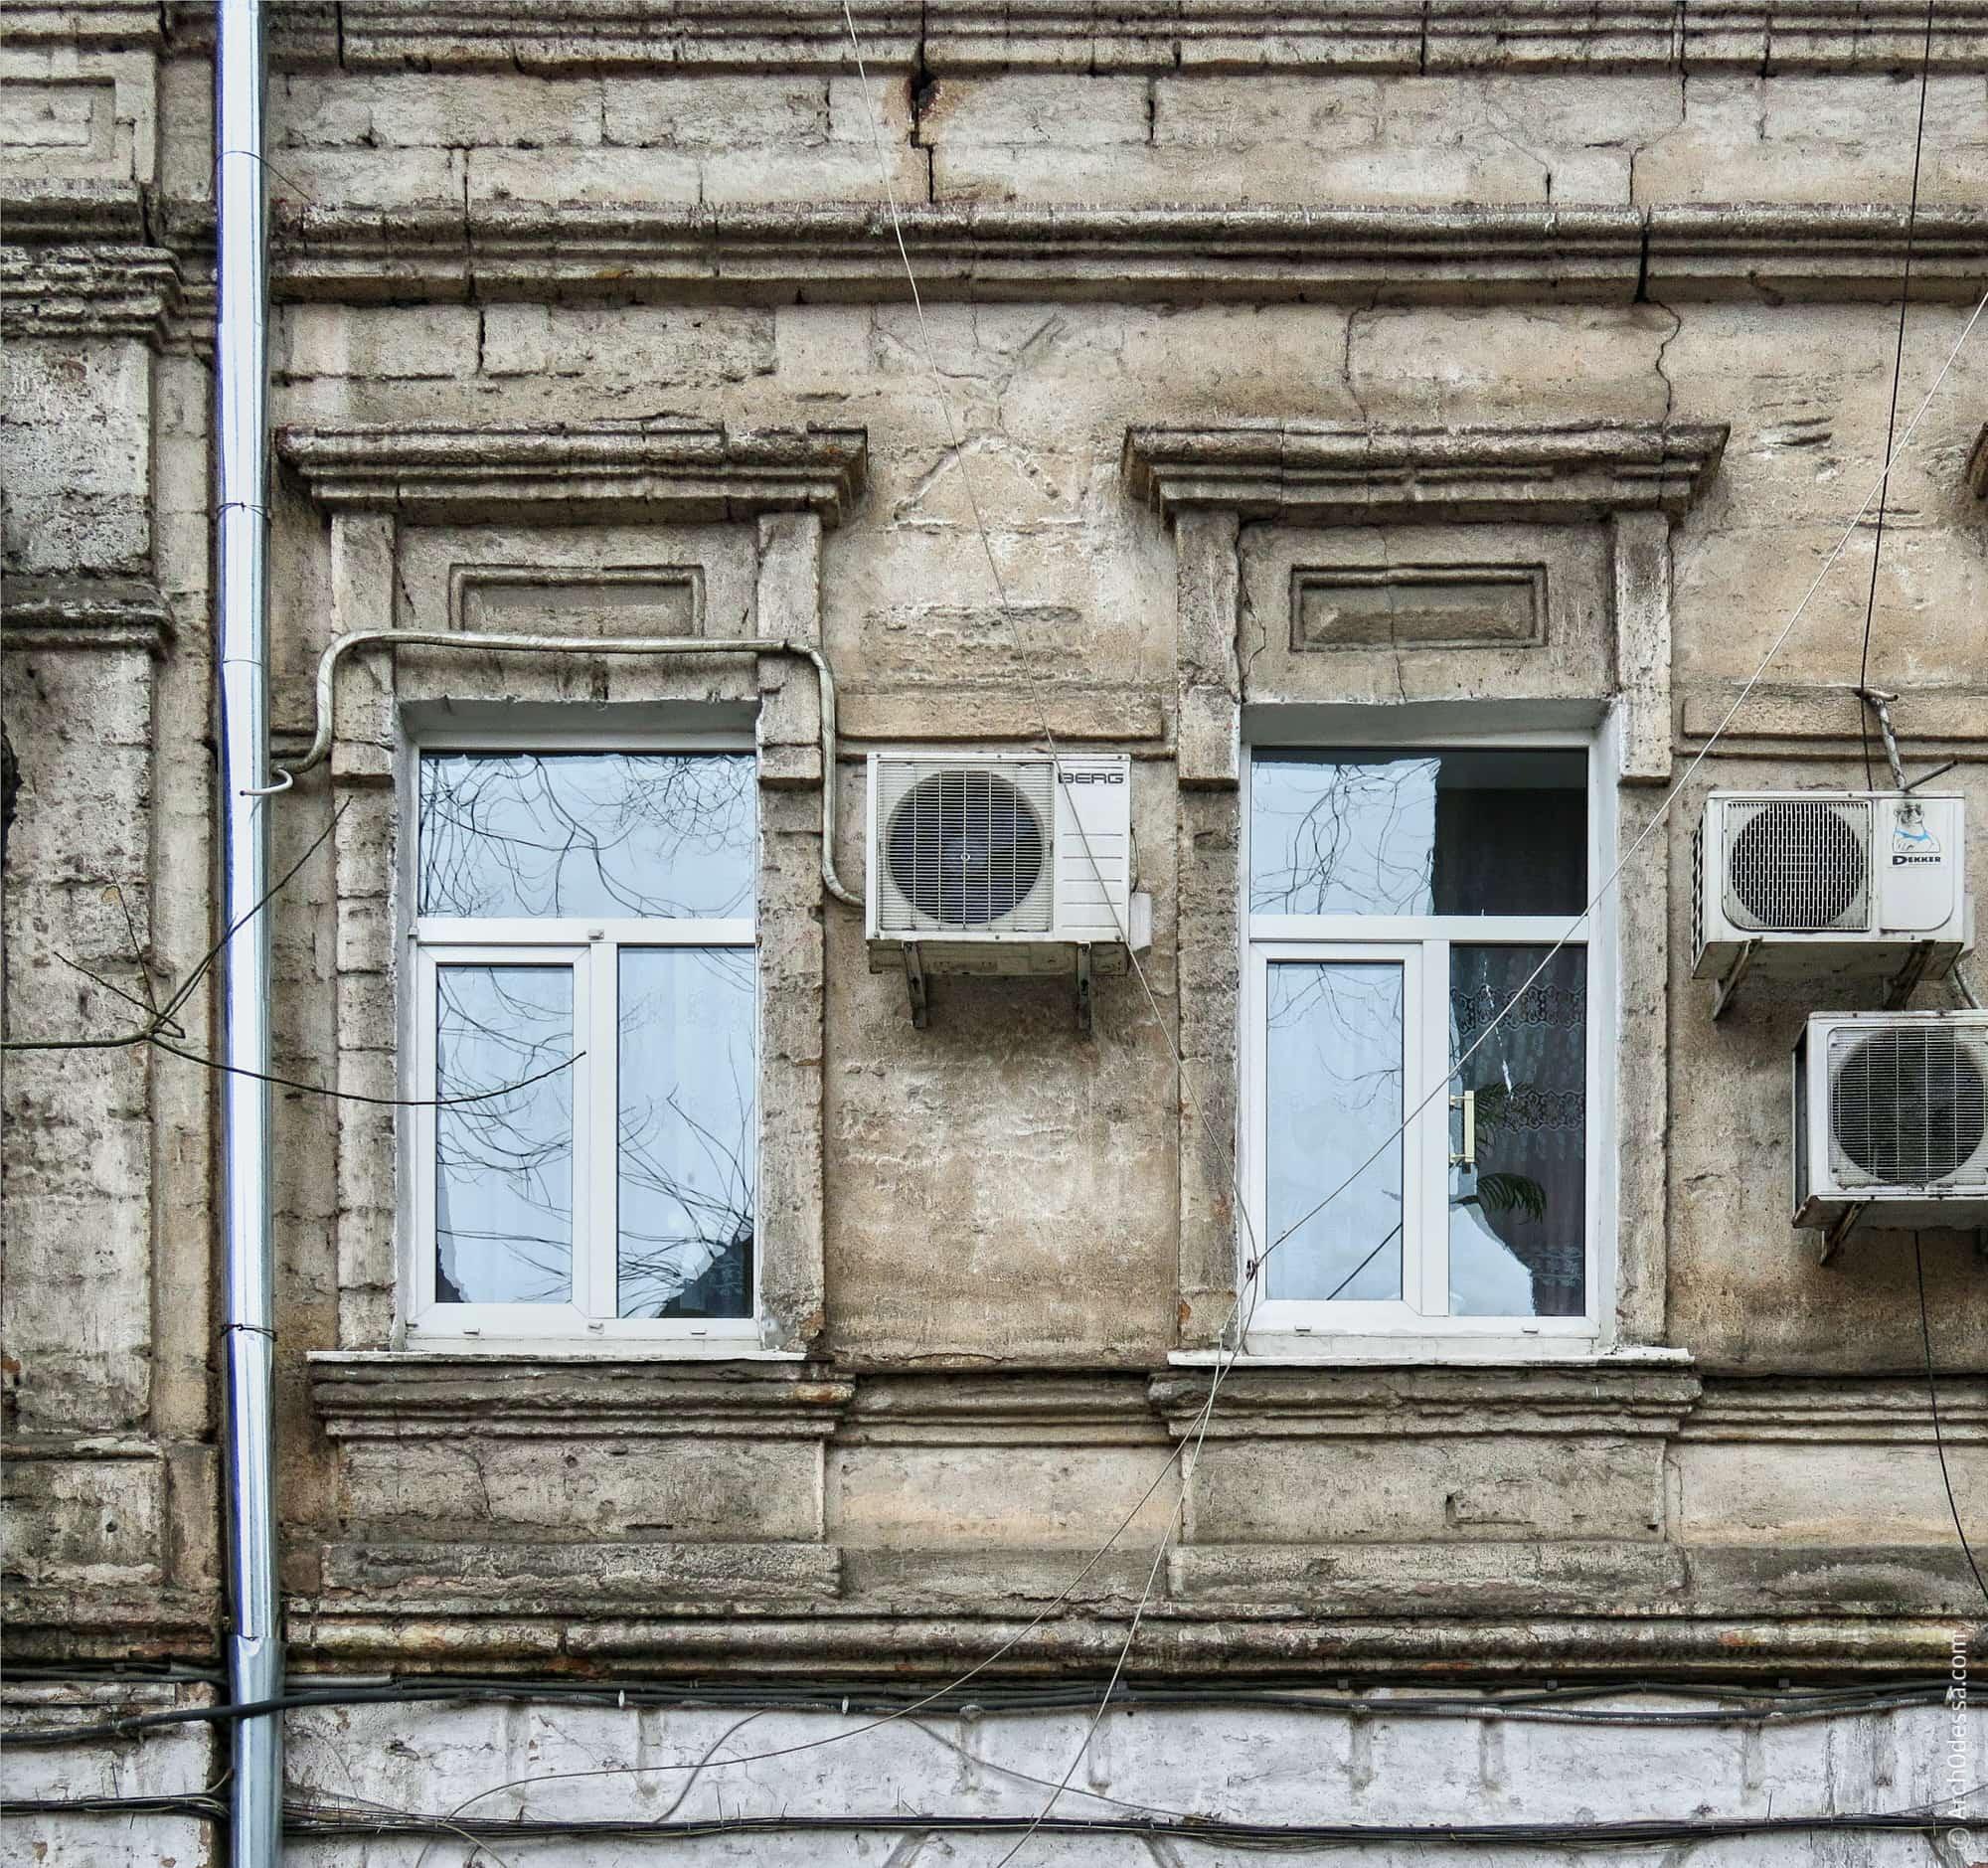 Окна с прямыми сандриками